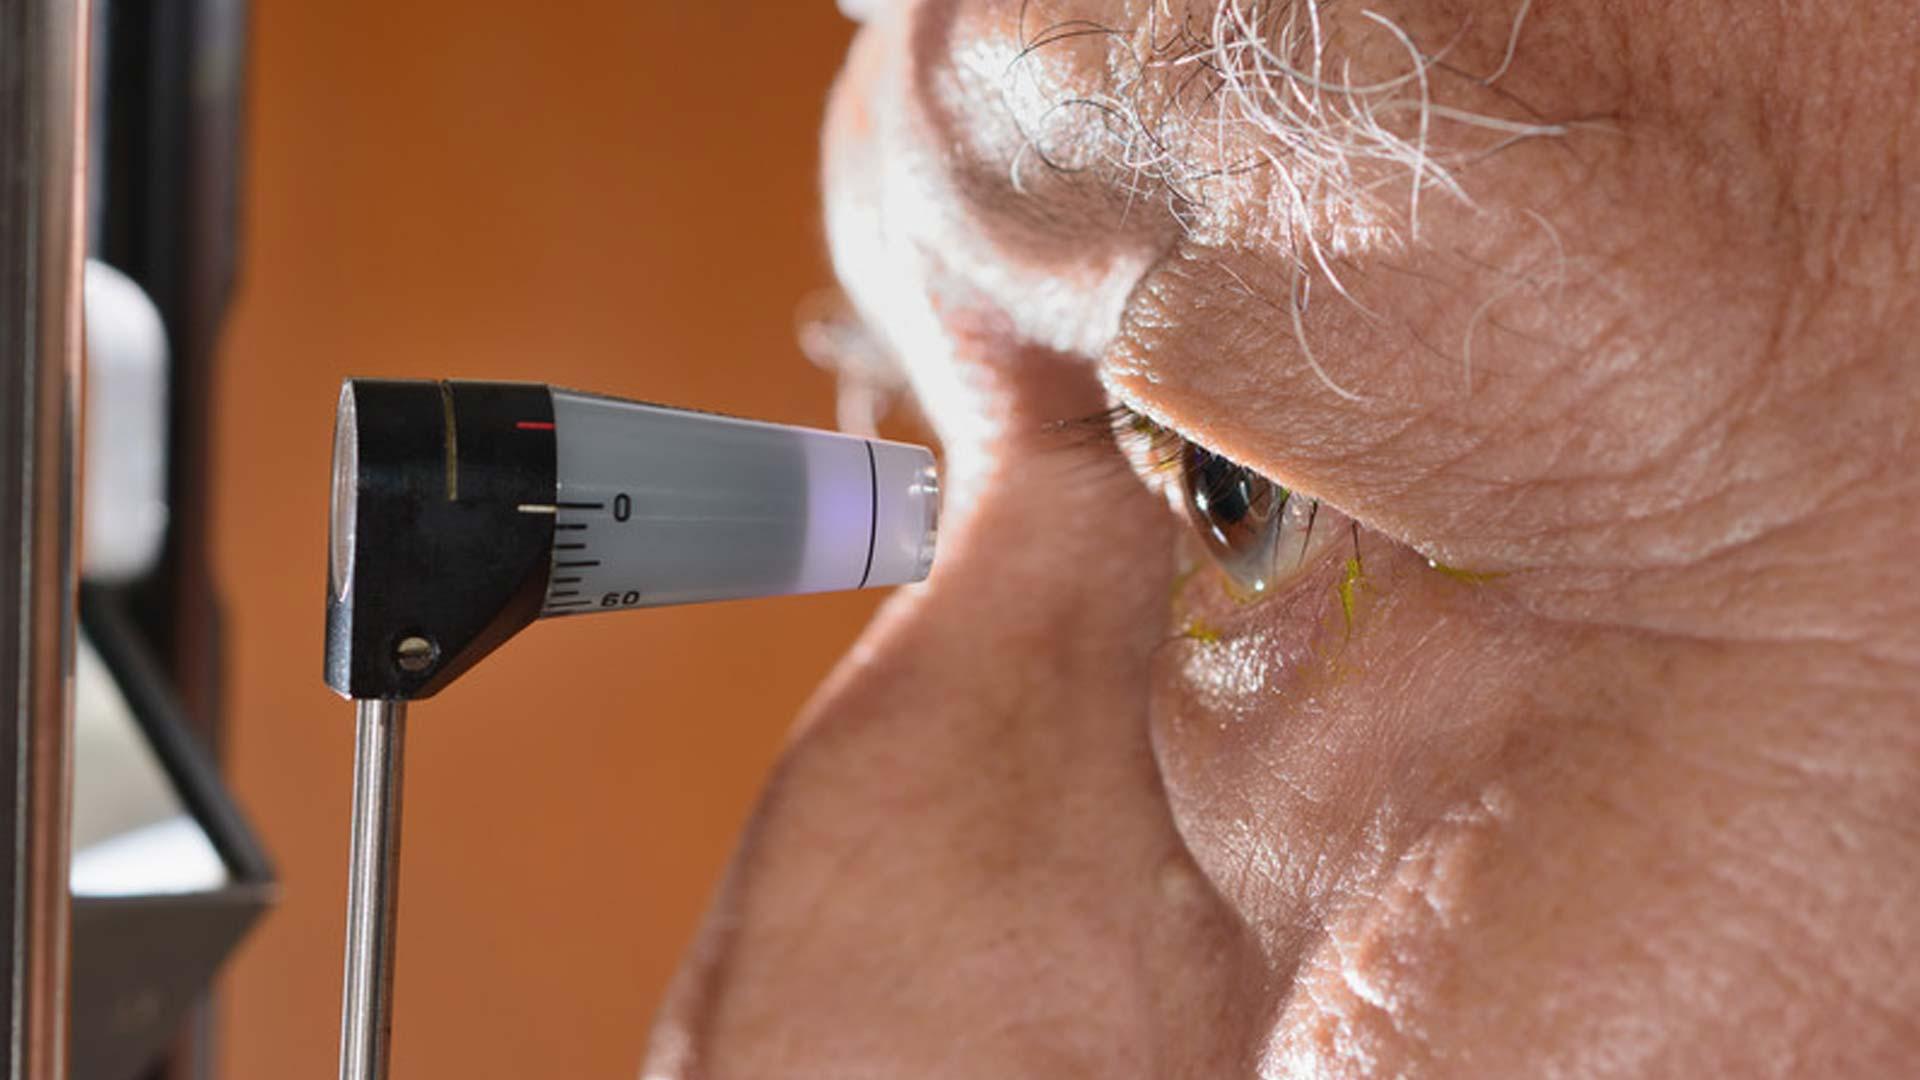 glaucoma testing